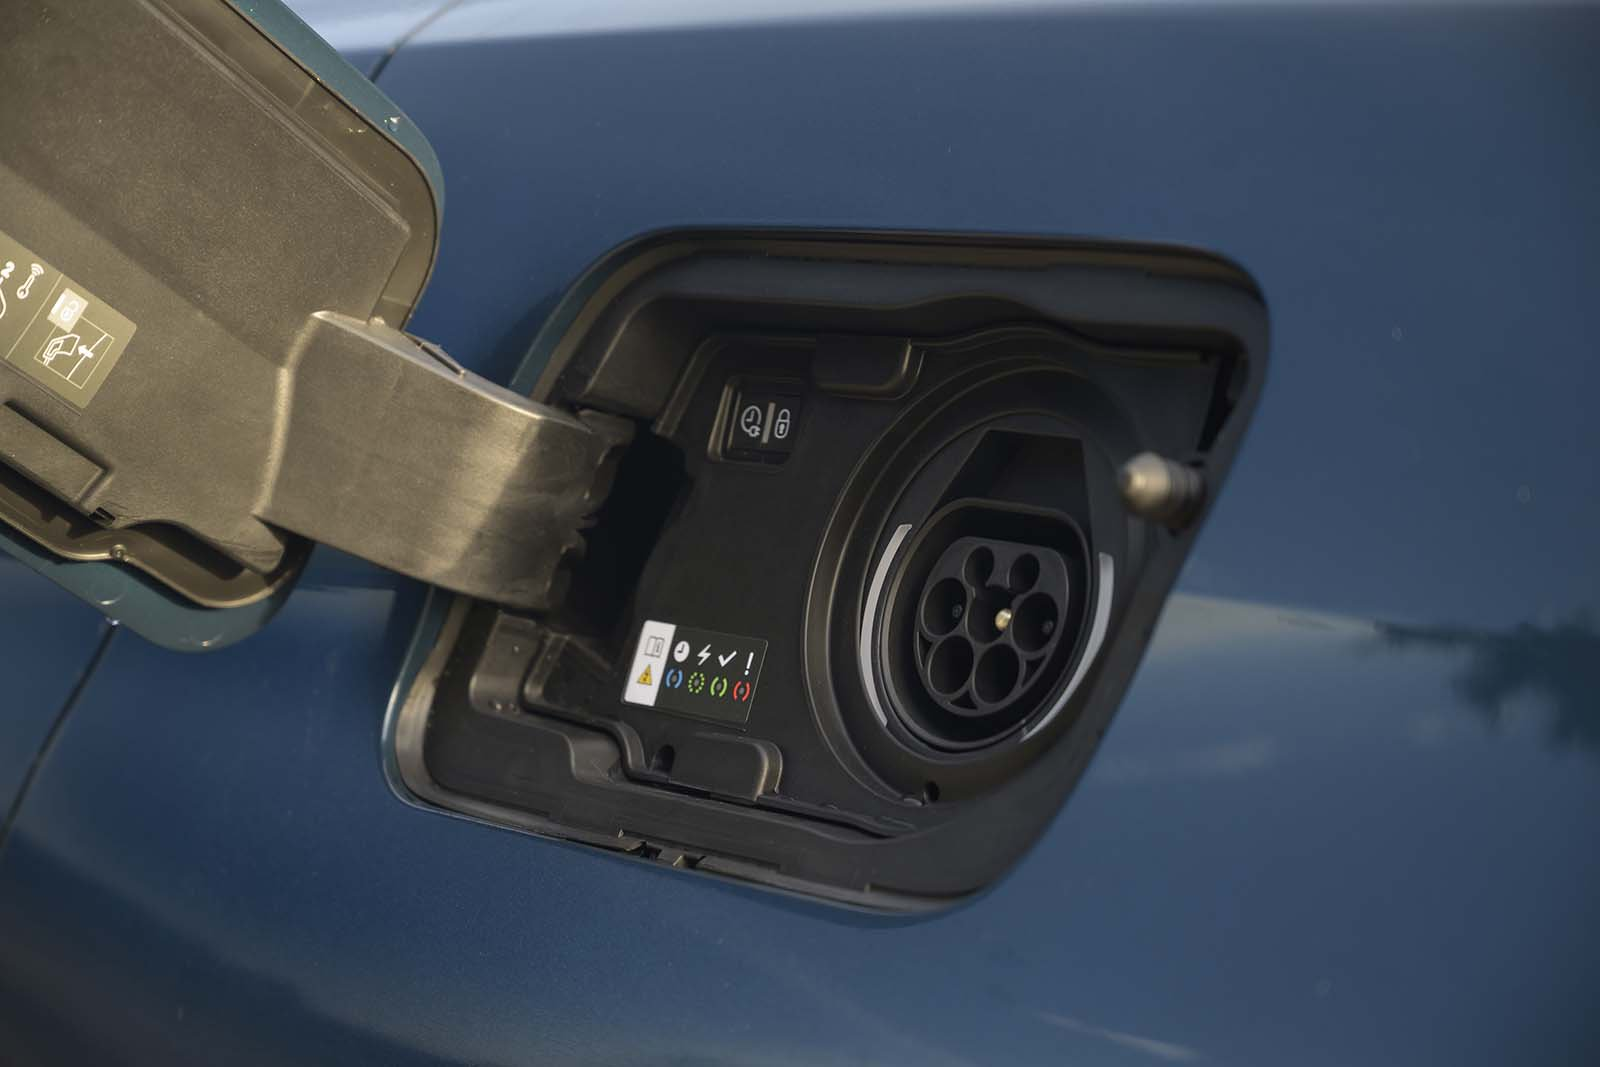 Peugeot 3008 2020 PHEV charge socket detail